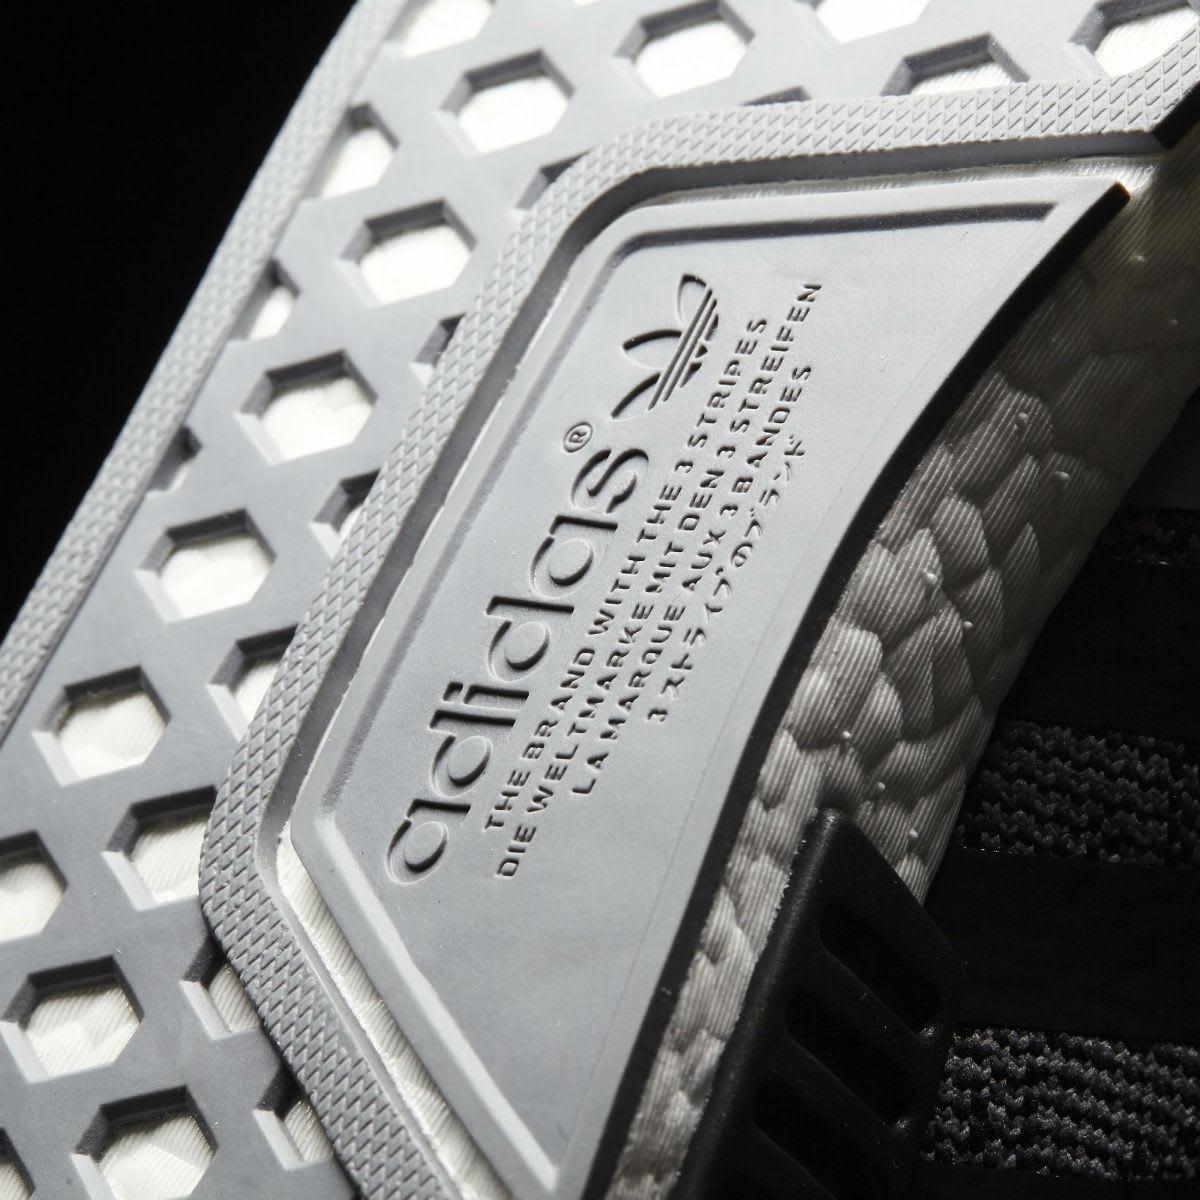 Adidas NMD R1 Primeknit Core Black White Outsole CQ1863